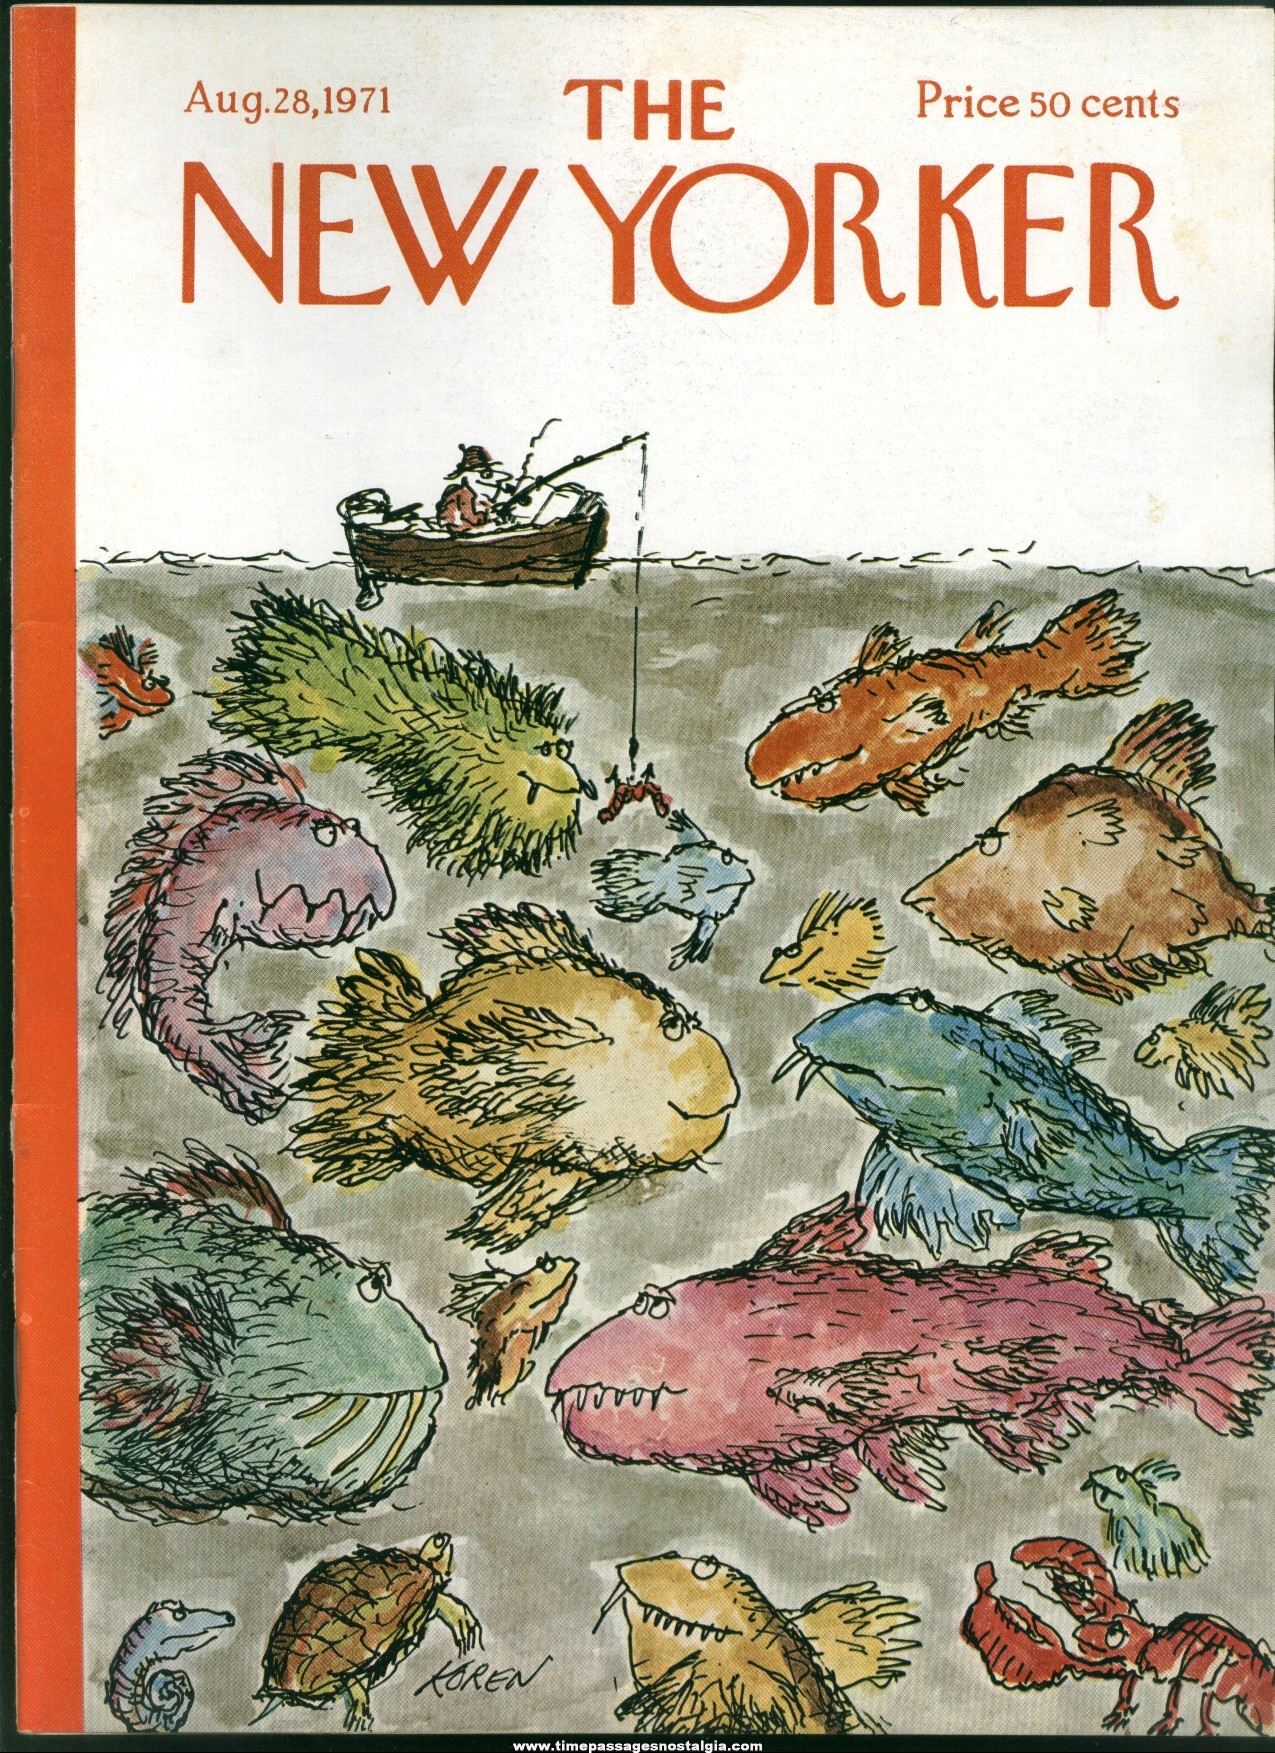 New Yorker Magazine - August 28, 1971 - Cover by Edward Koren